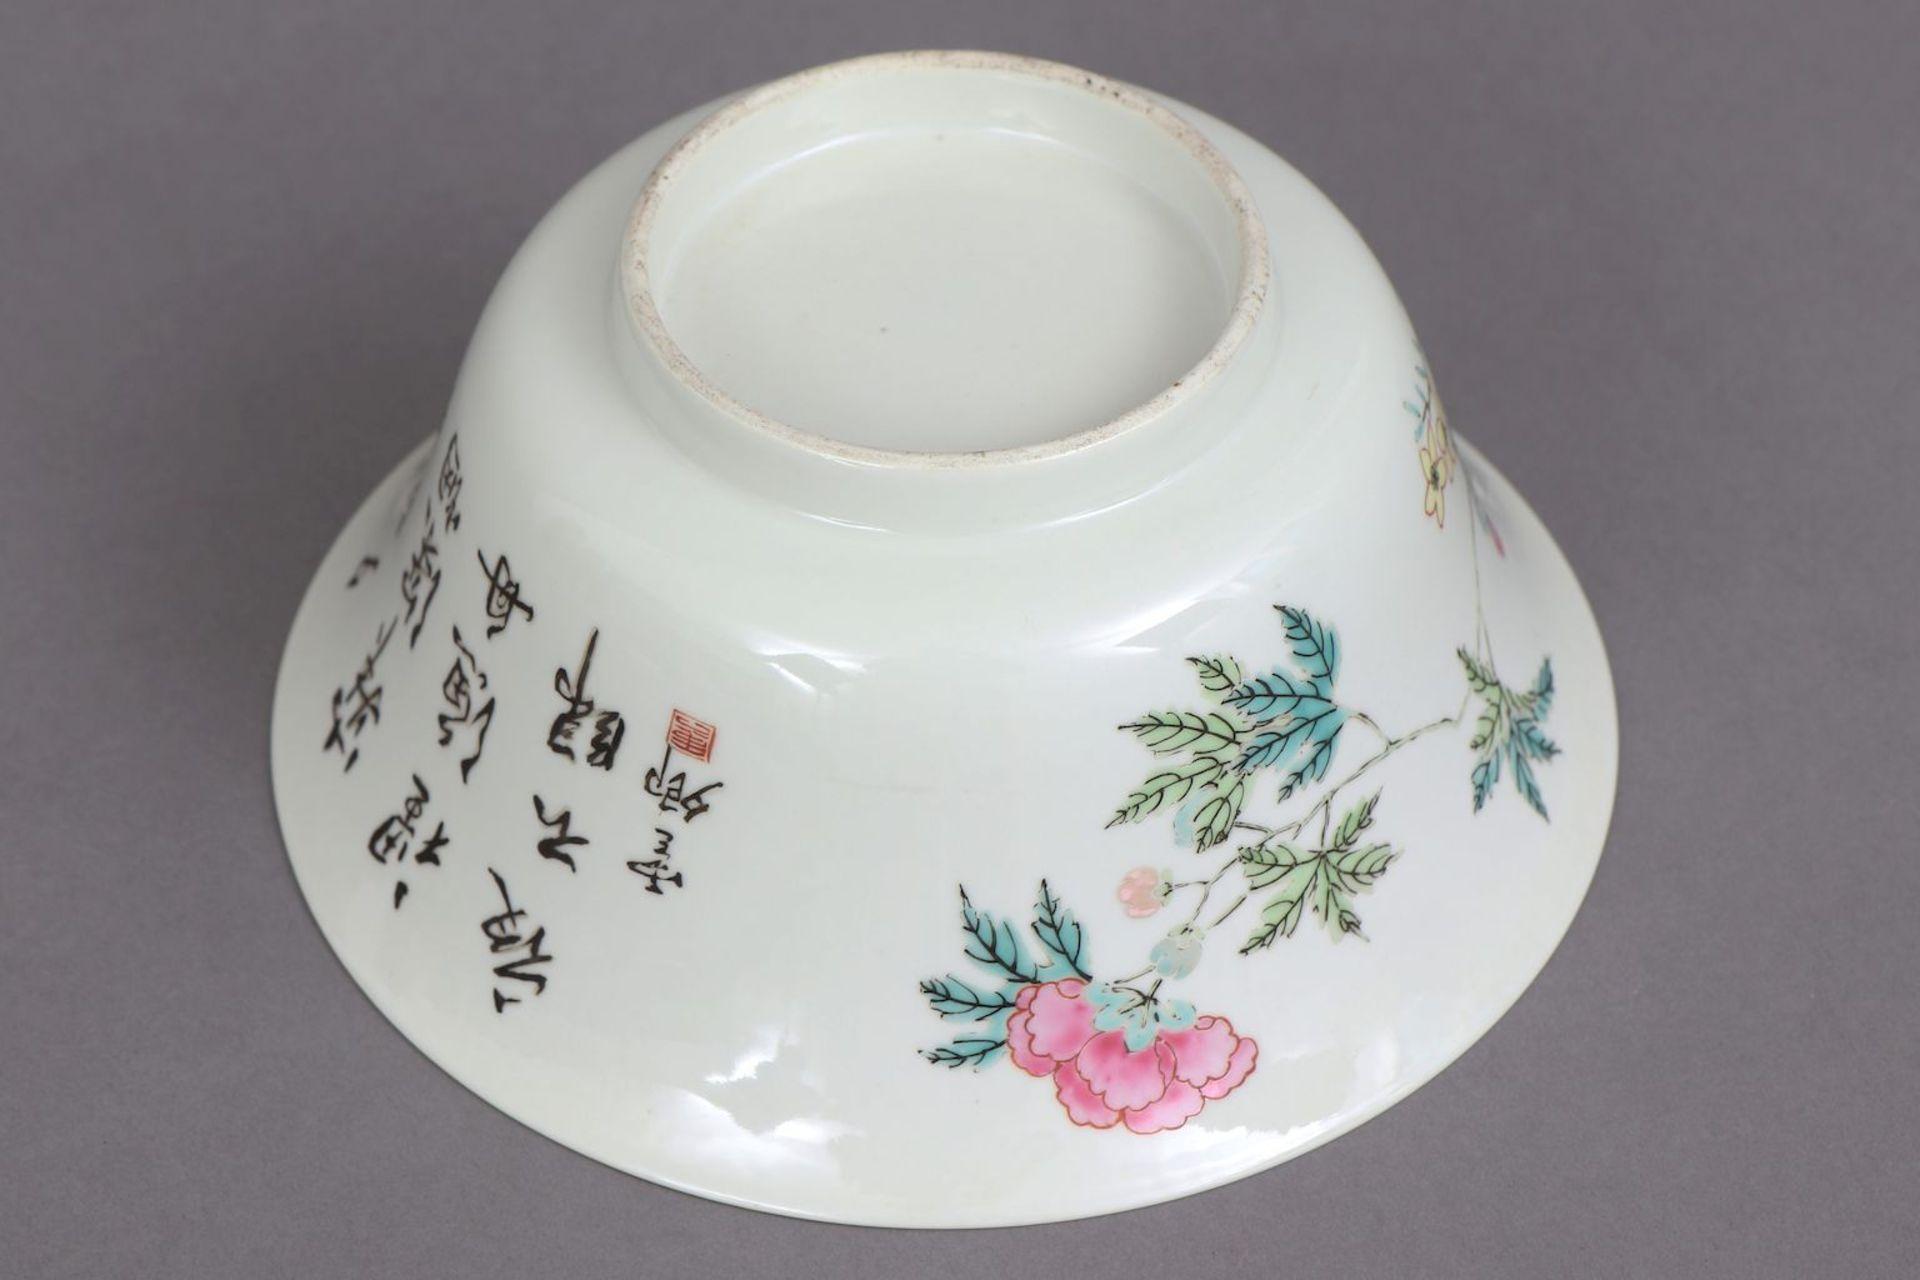 Chinesische Porzellanschale/Kuppa - Image 4 of 4